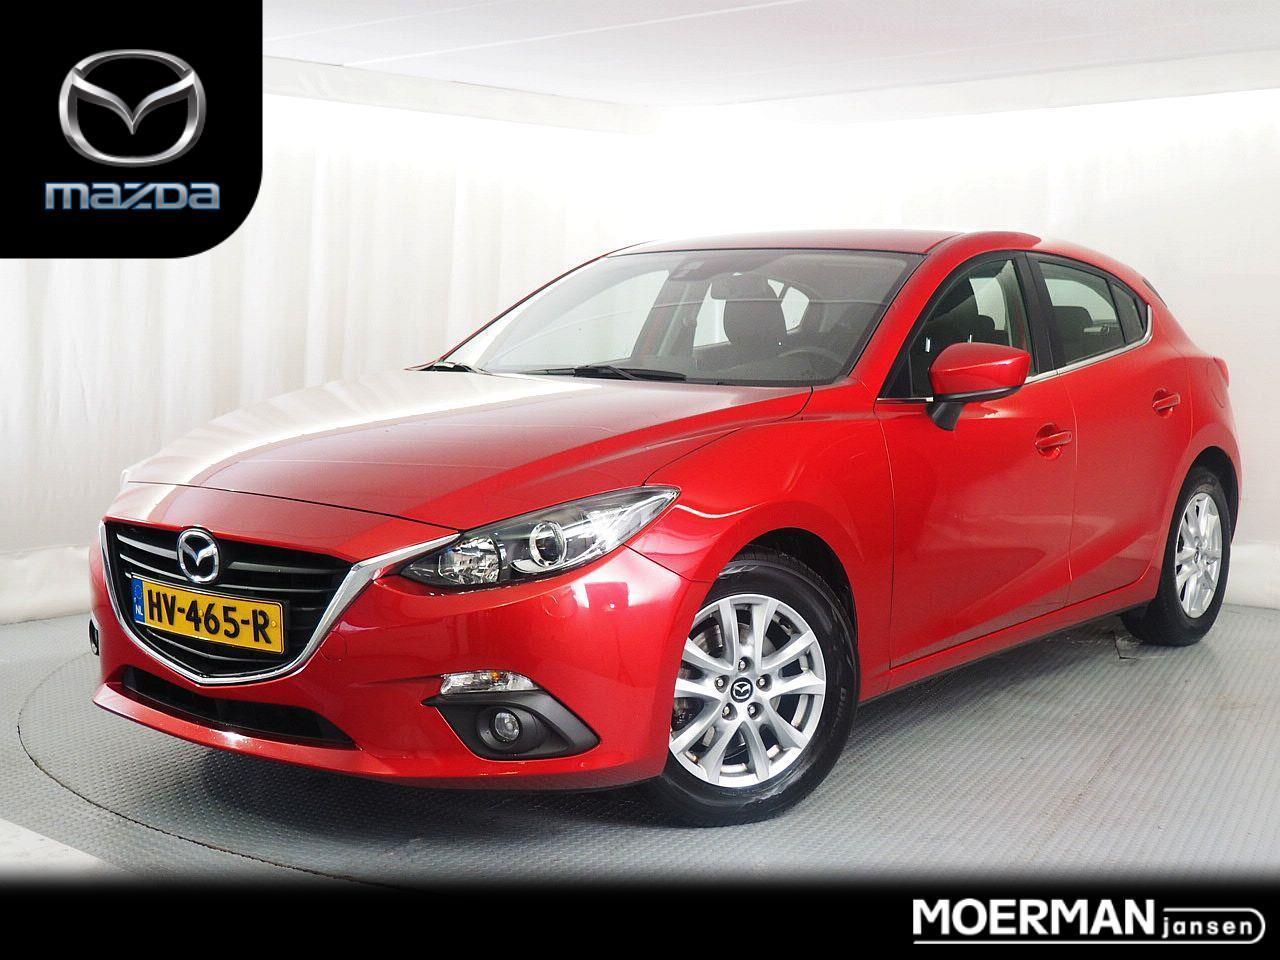 Mazda 3 2.0 ts / navigatie / dealerauto / parkeersensoren / 61.000km